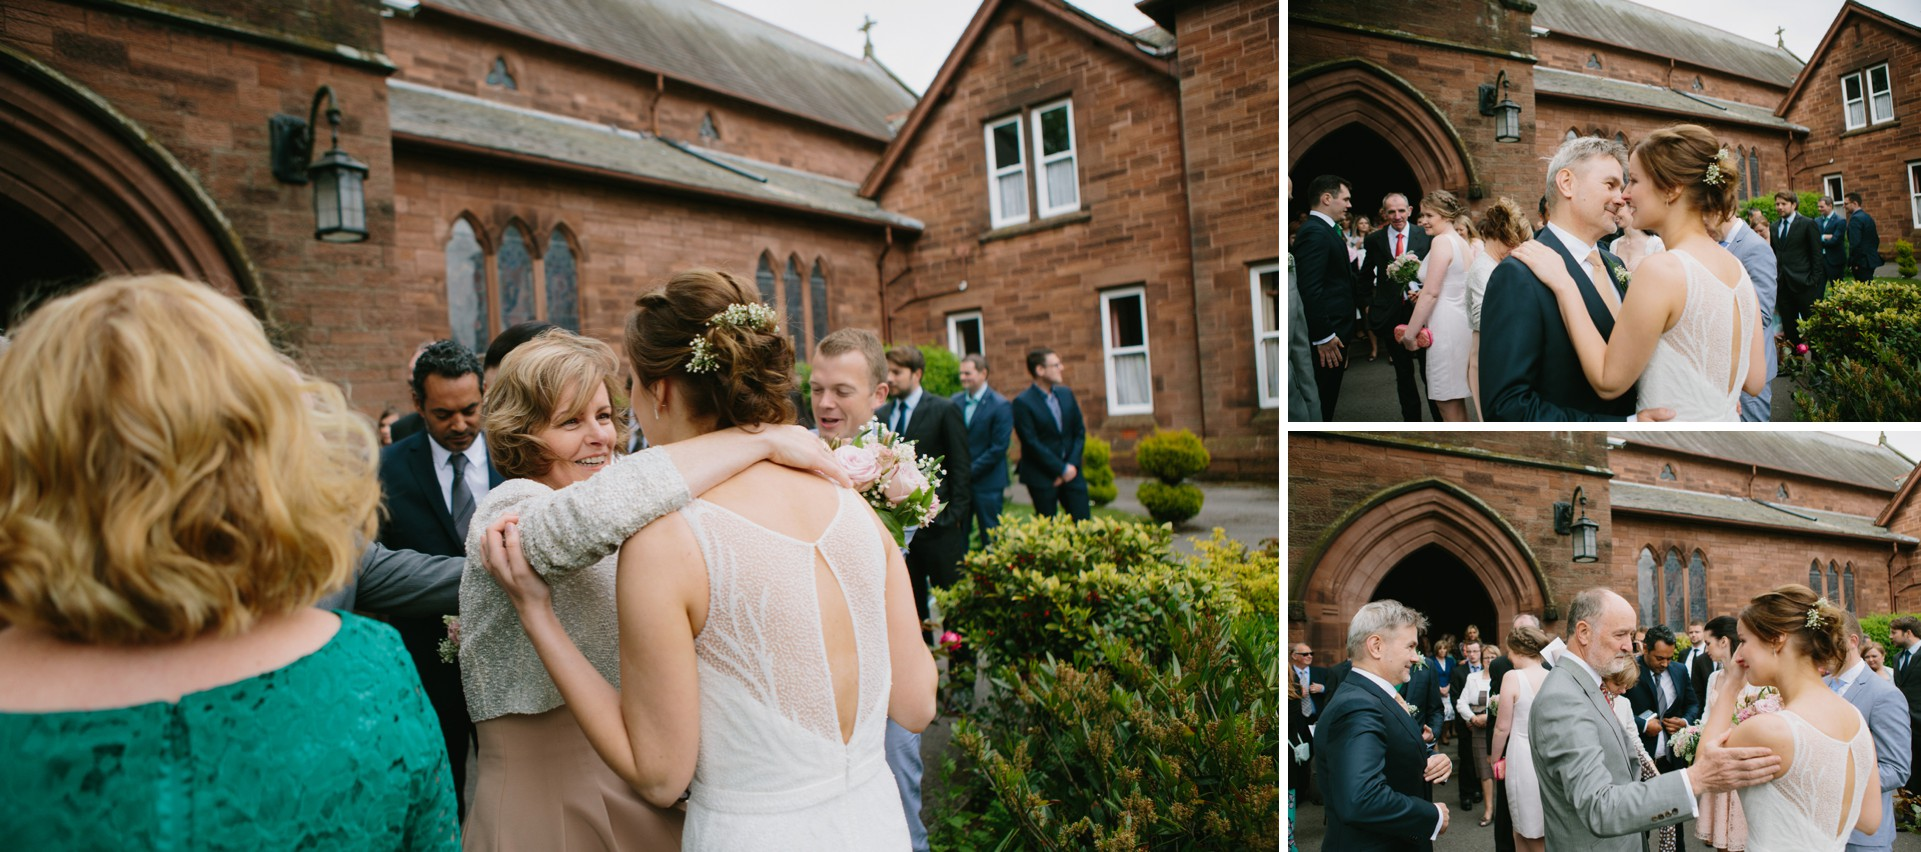 lake-district-wedding-photographer-emese-lorcan_0038